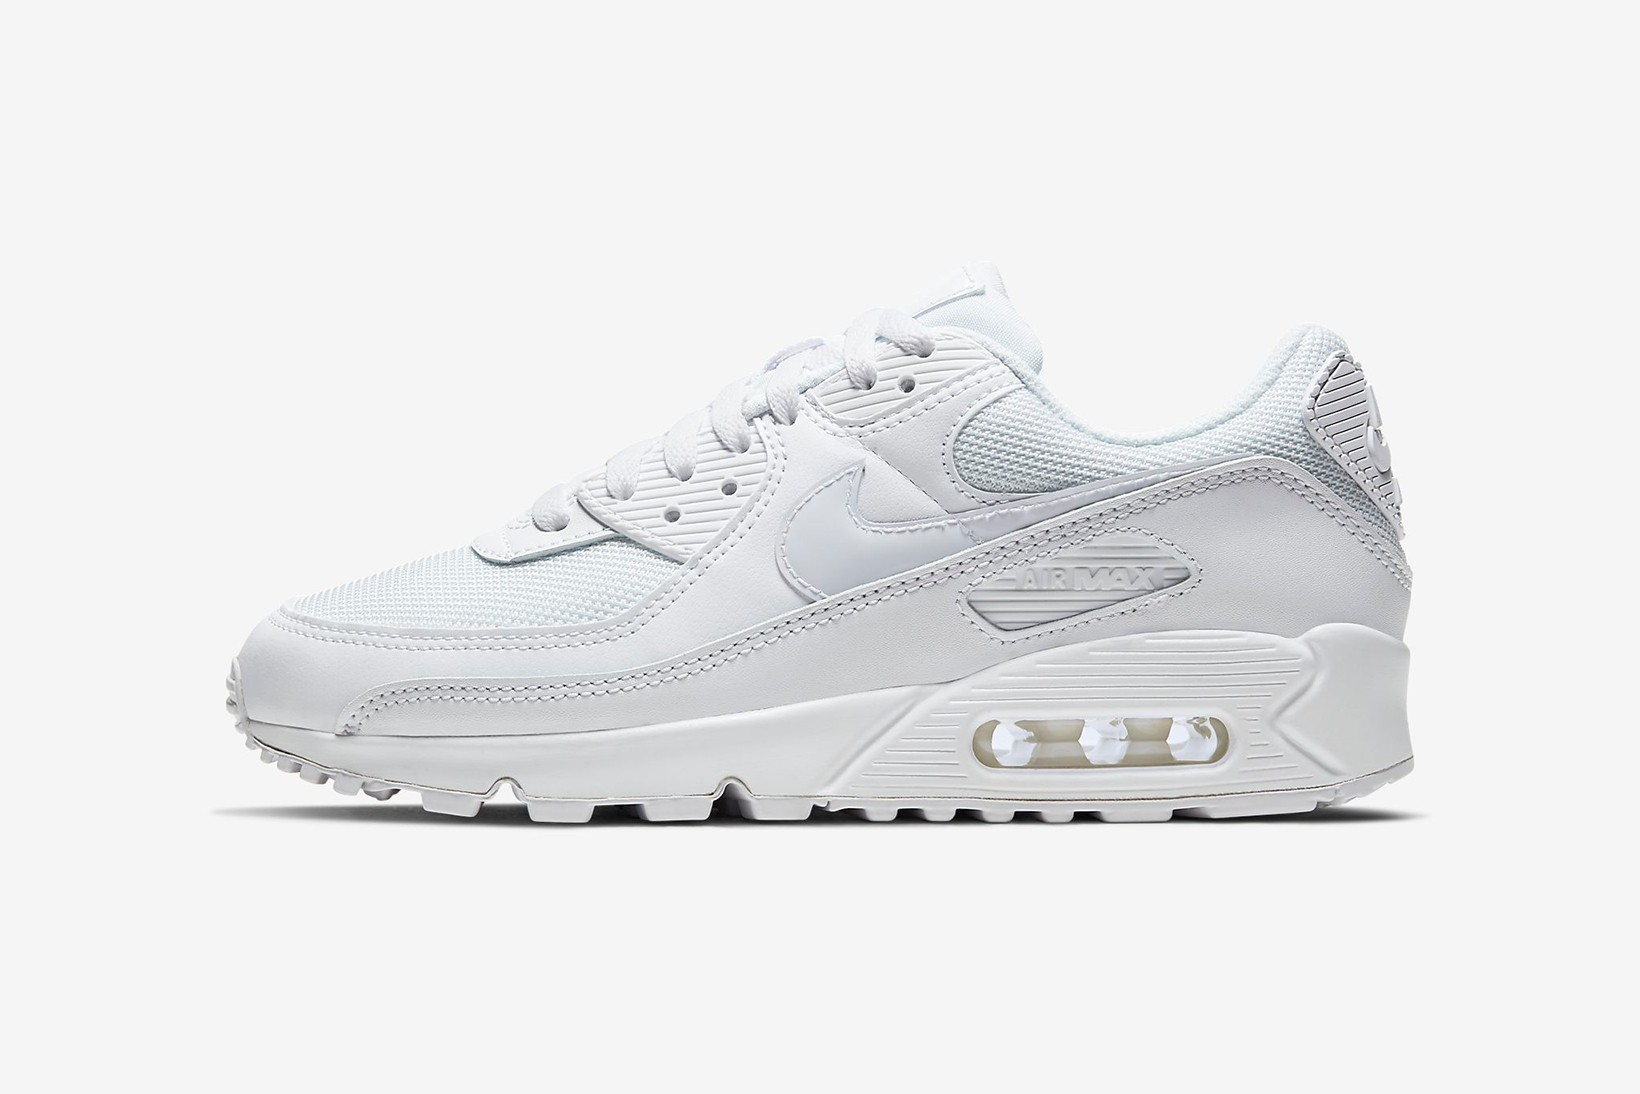 Nike Women's Air Max 90 Twist Sneaker